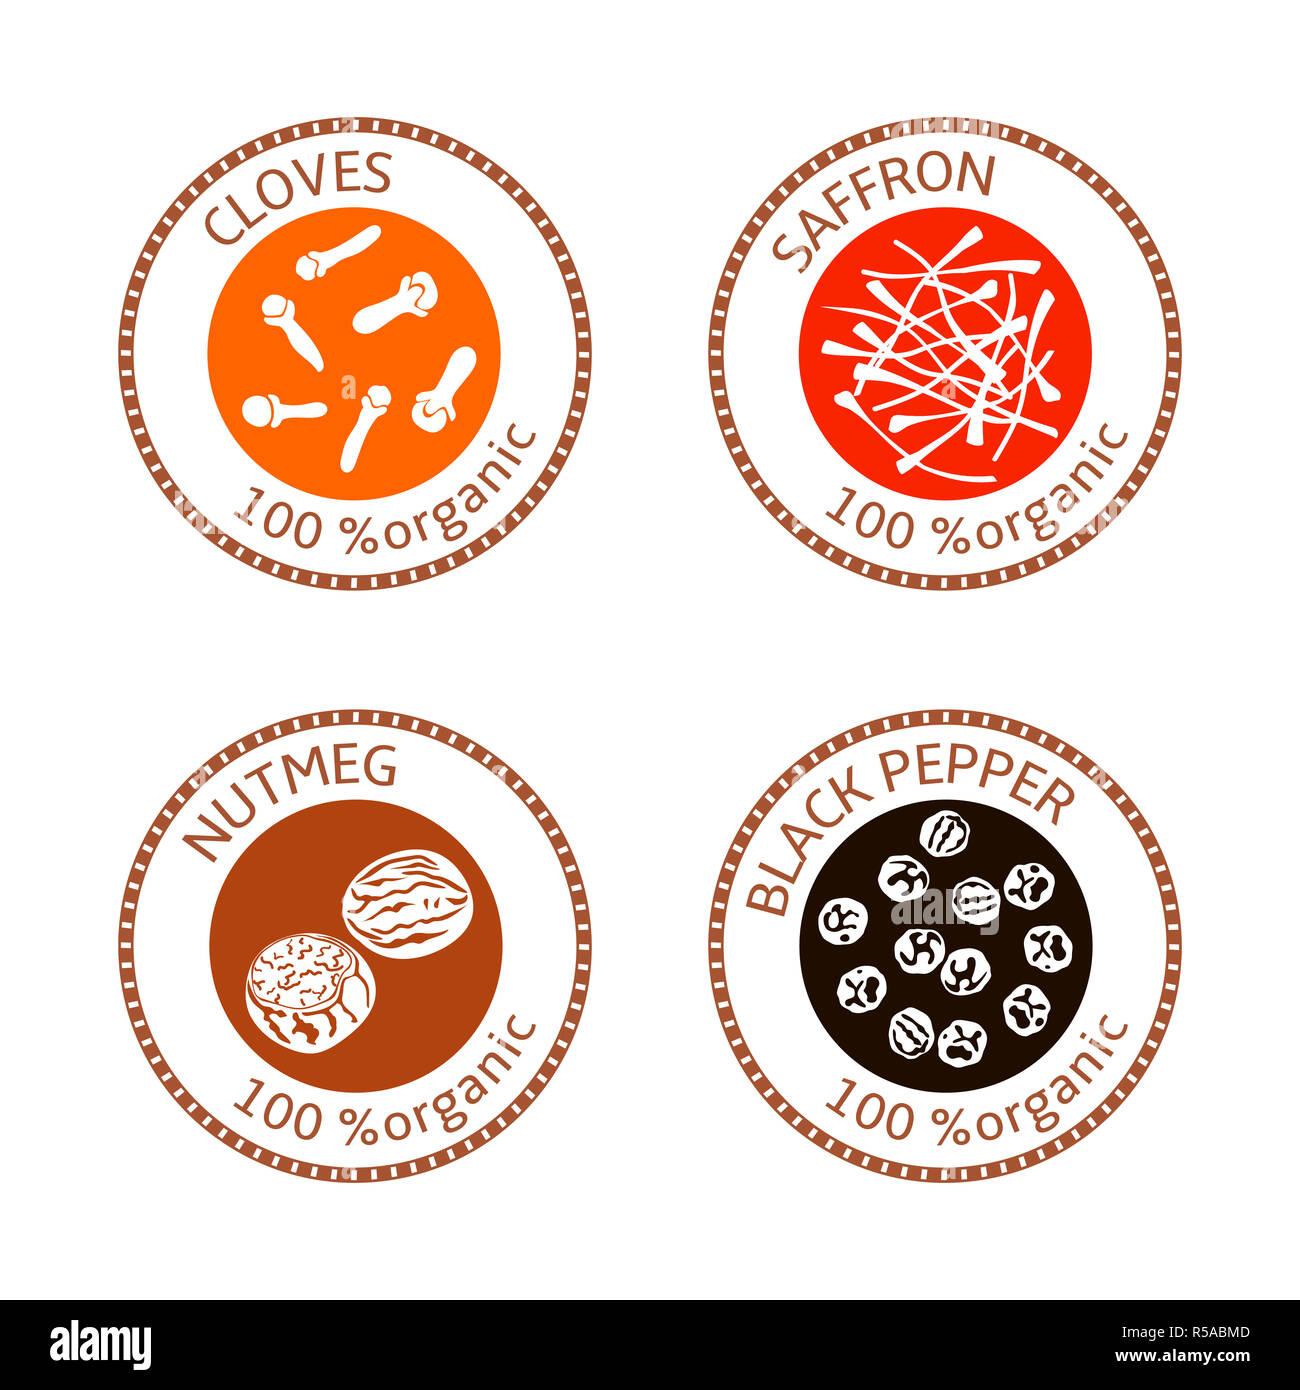 Mint Leaves Organic Logo Concept: Flat Spice Logo Stock Photos & Flat Spice Logo Stock